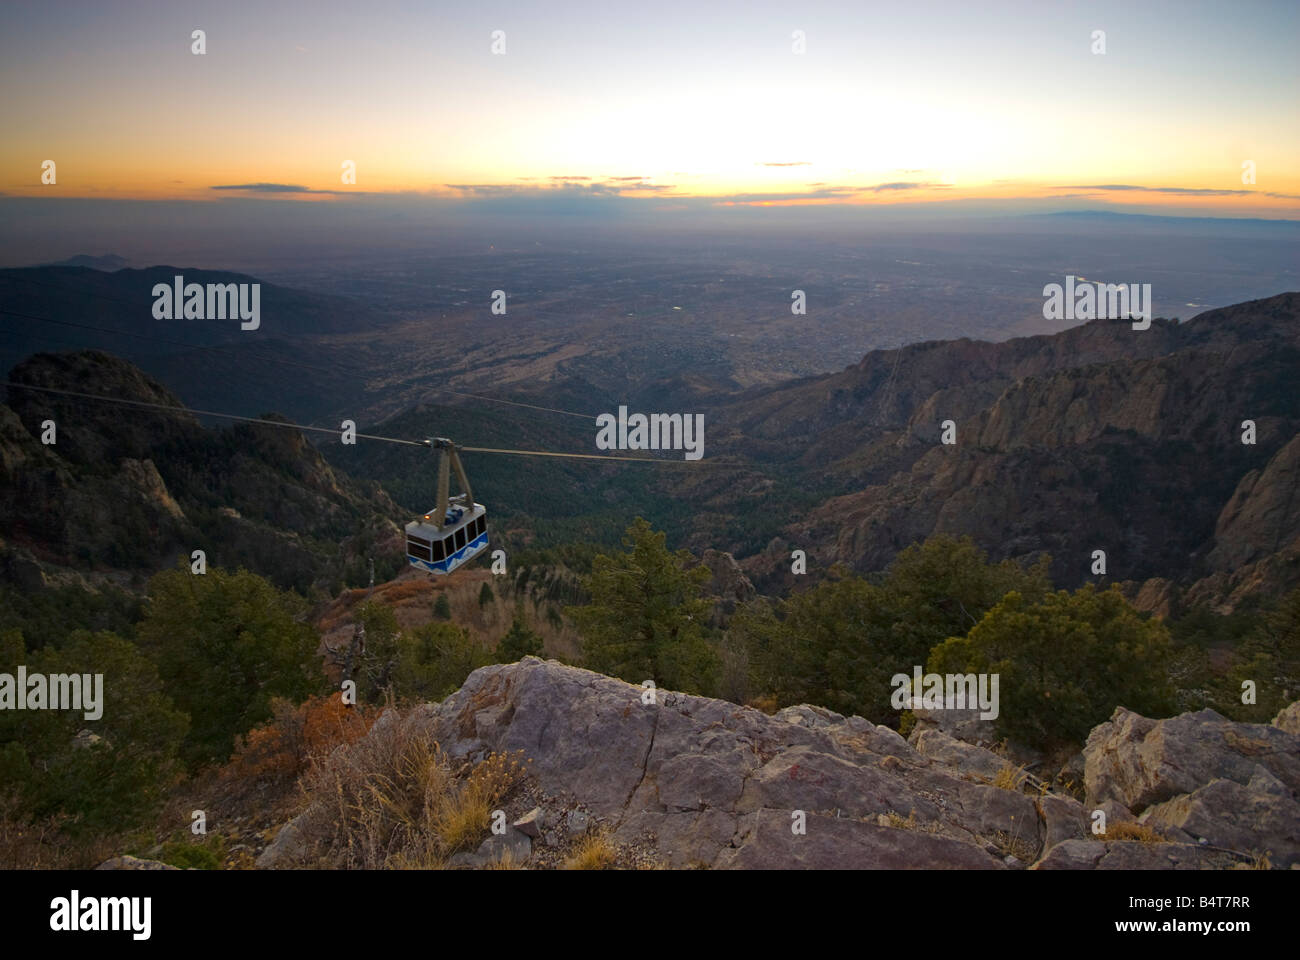 USA, New Mexico, Albuquerque from Sandia Mountains, Sandia Peak Tramway (cablecar) Stock Photo